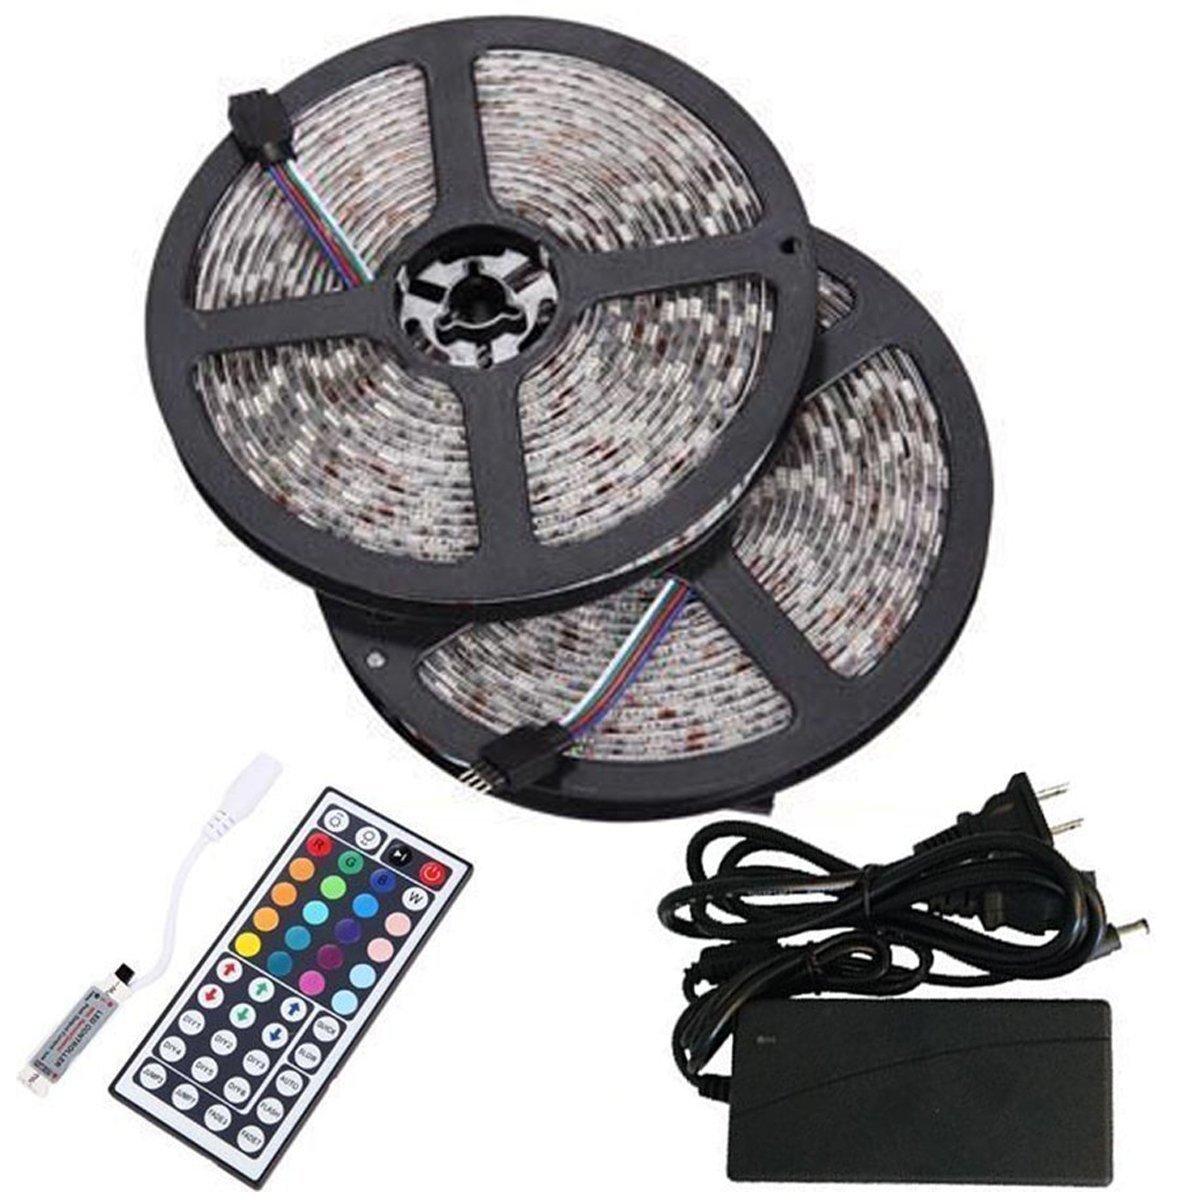 sc 1 st  Party Supply Factory & BMOUO 2 Reels 12V 32.8ft Waterproof Flexible RGB LED Strip Light Kit ...